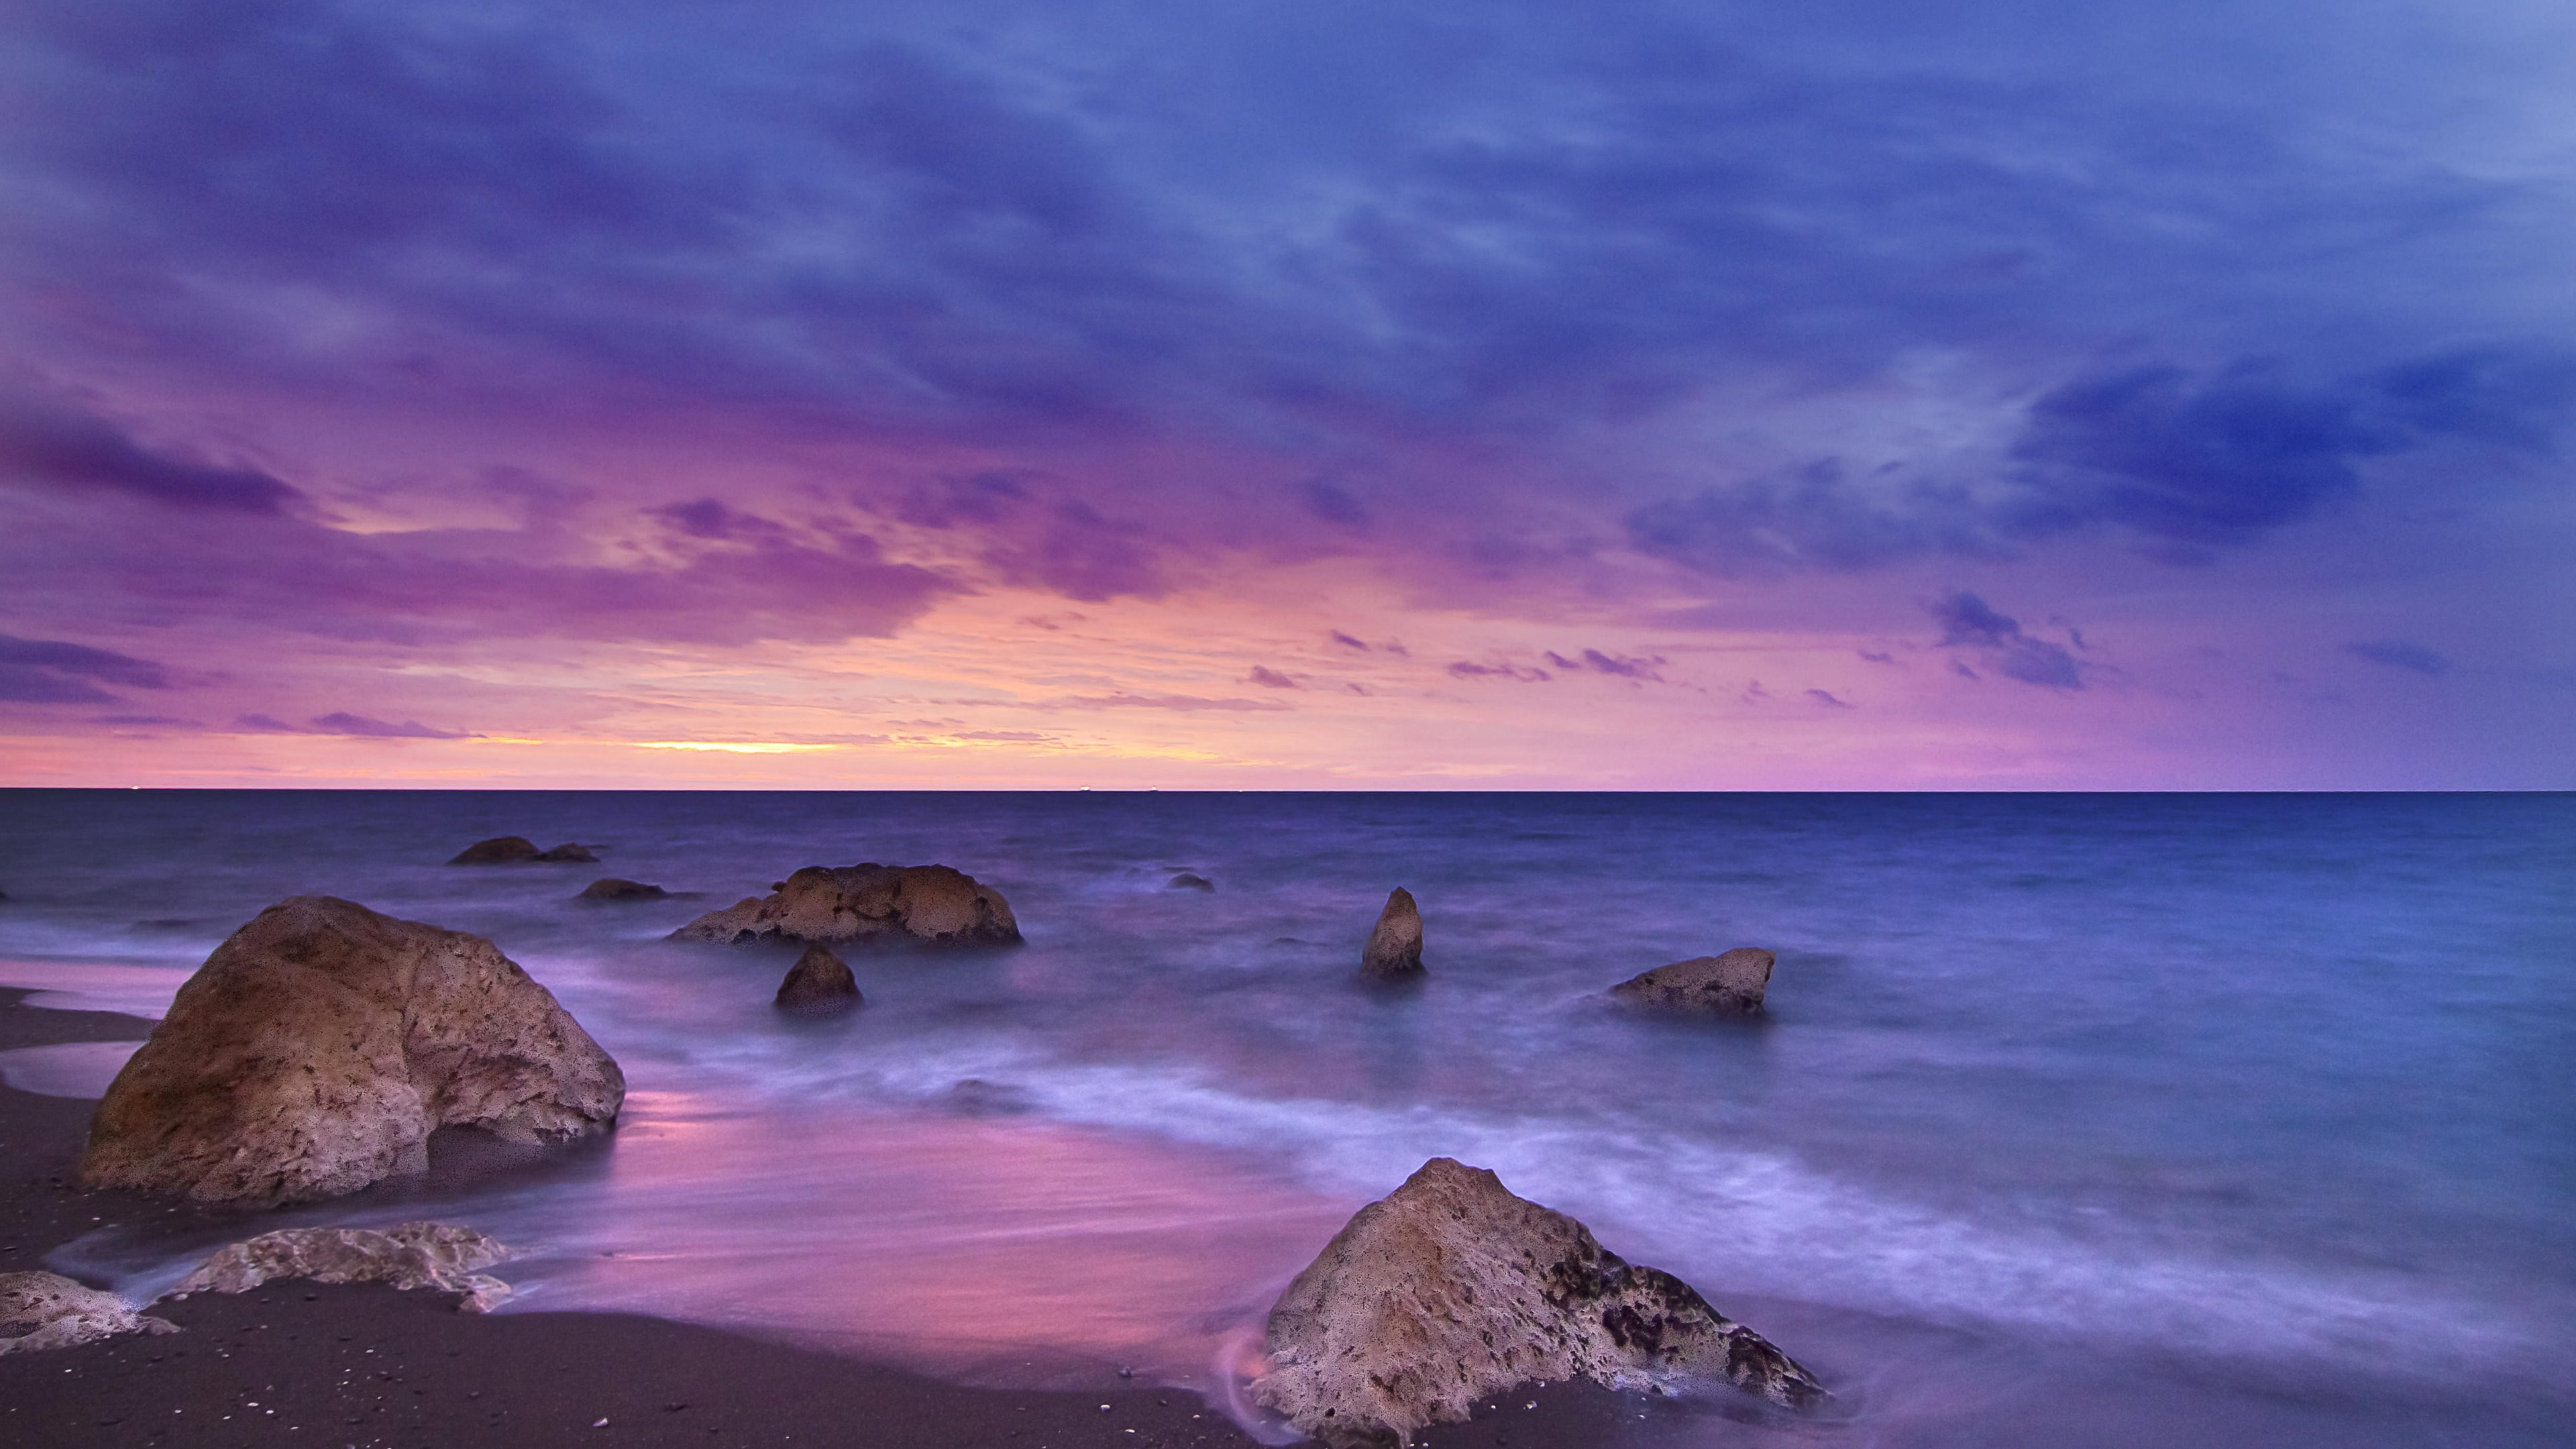 beach & ocean wallpaper for mobile, desktop, hd